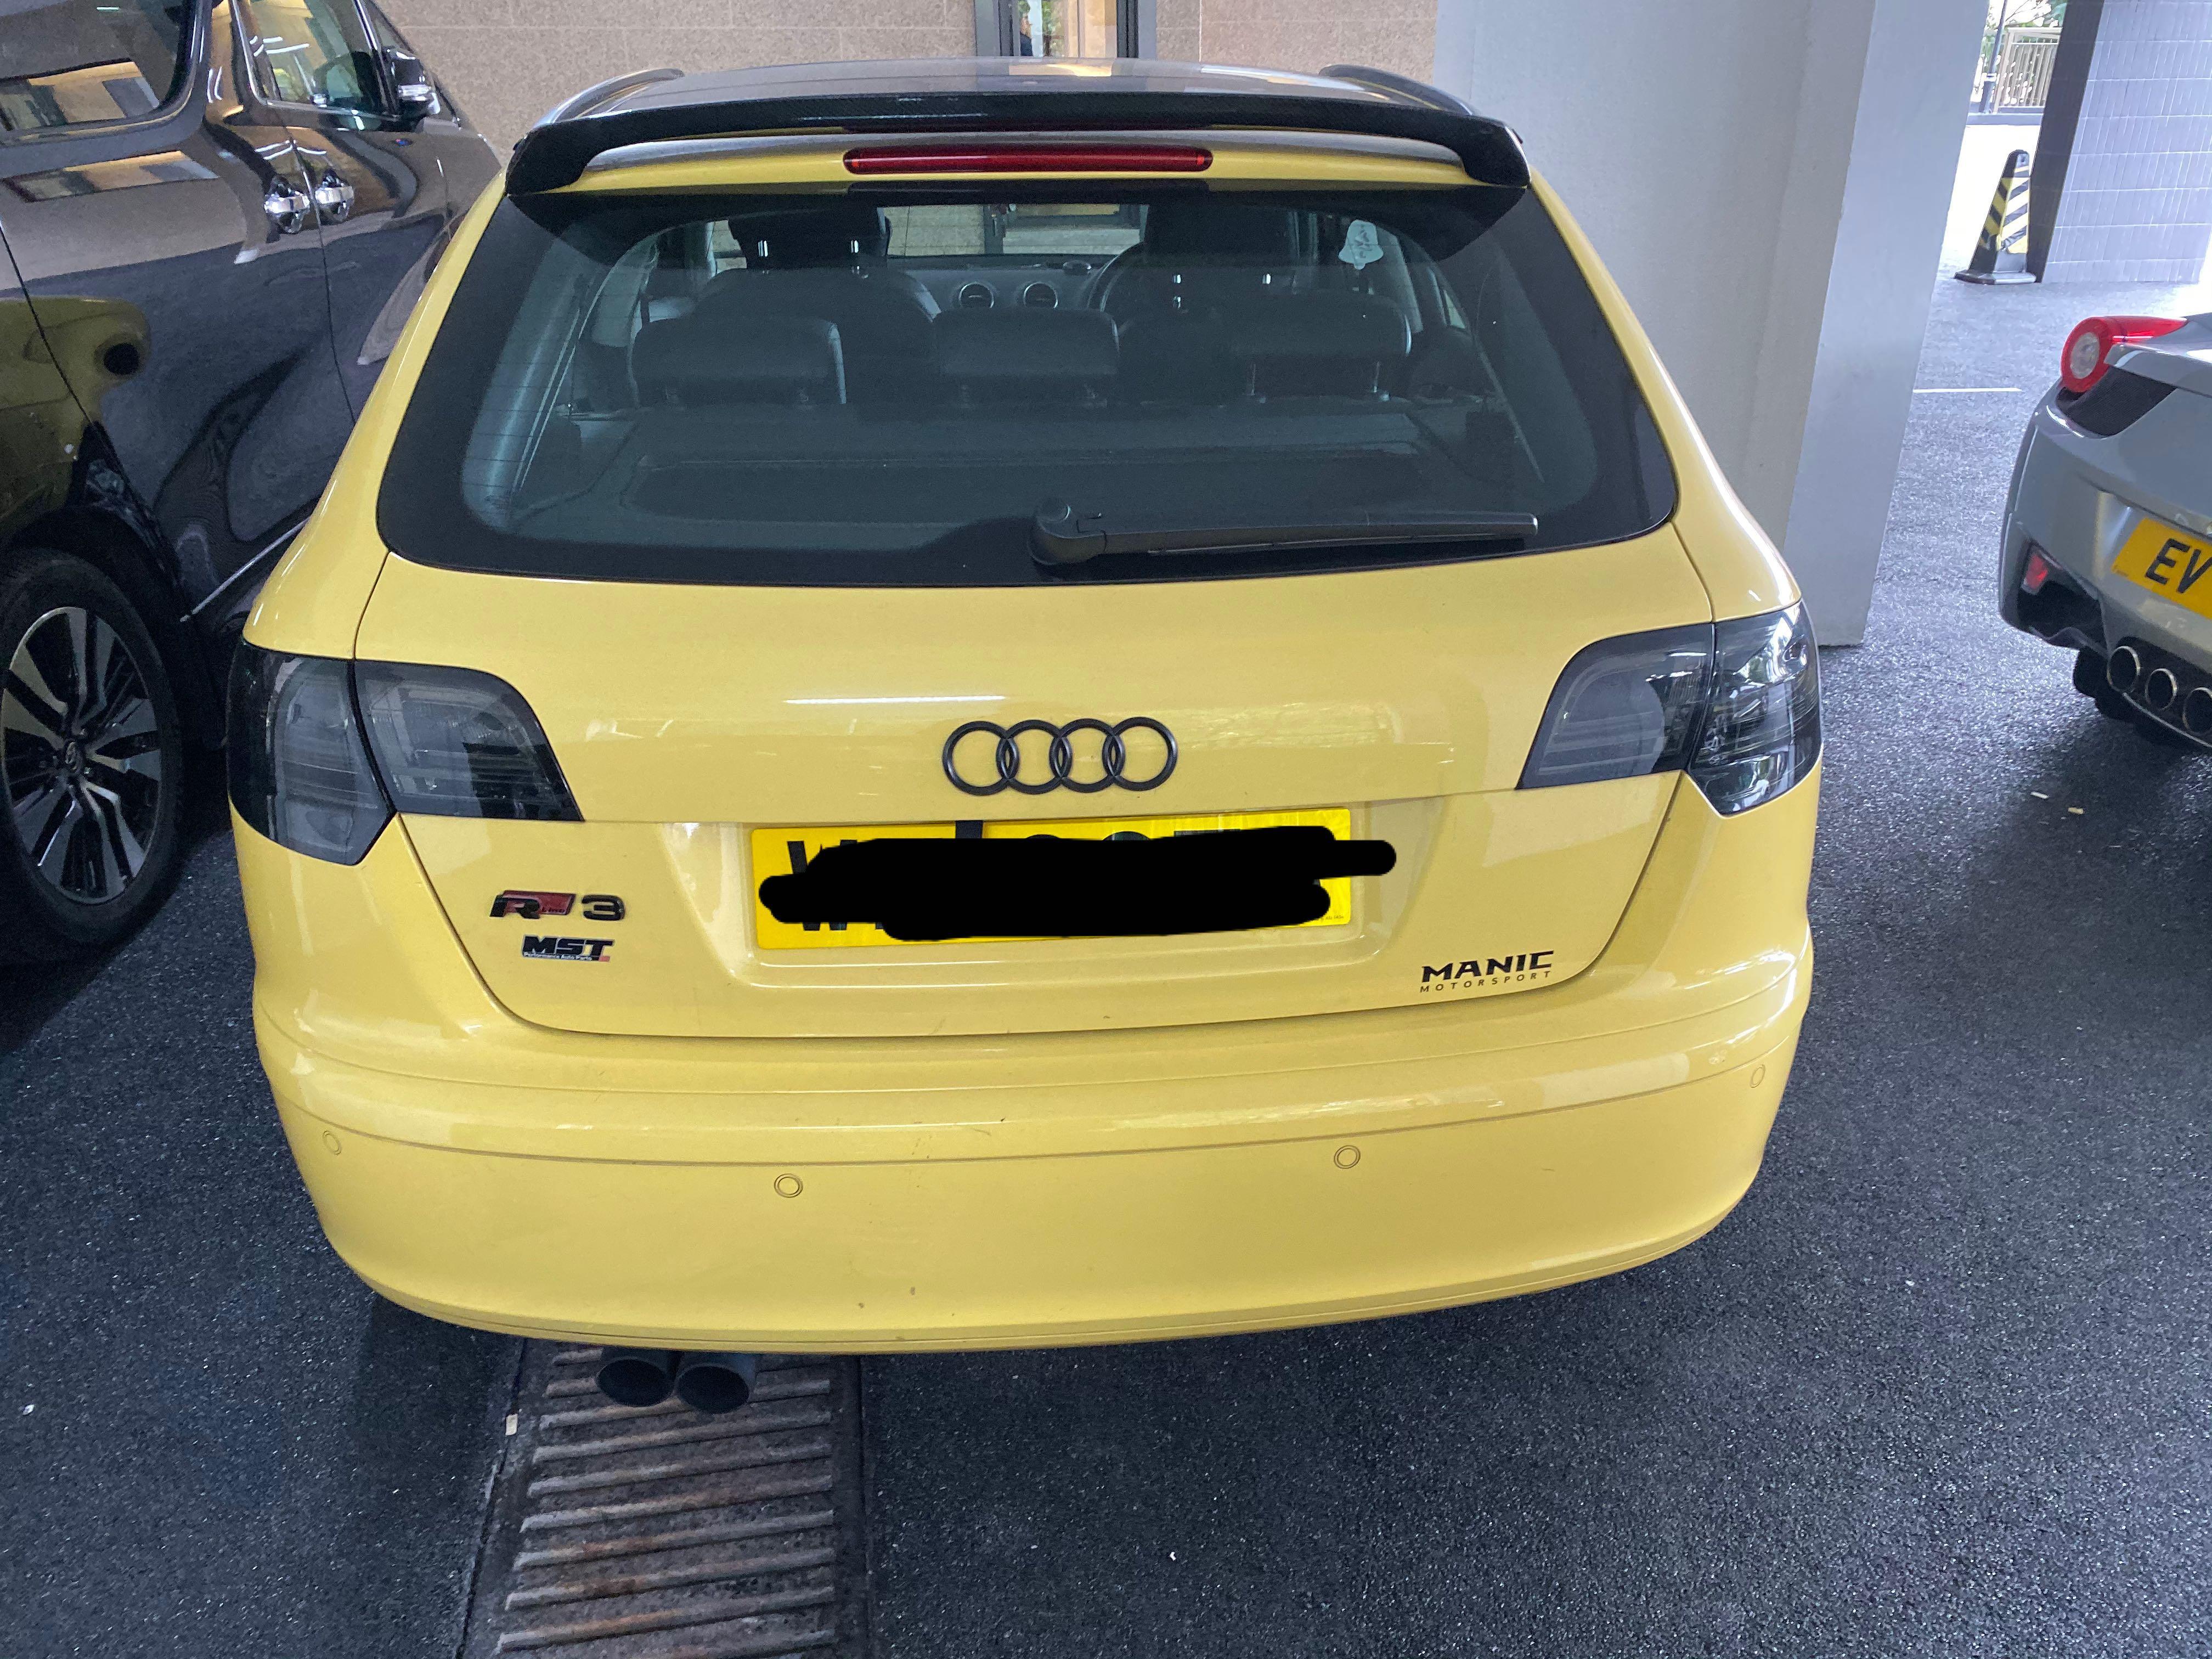 Audi A3 Cabriolet 1.8 TFSI DSG (A)